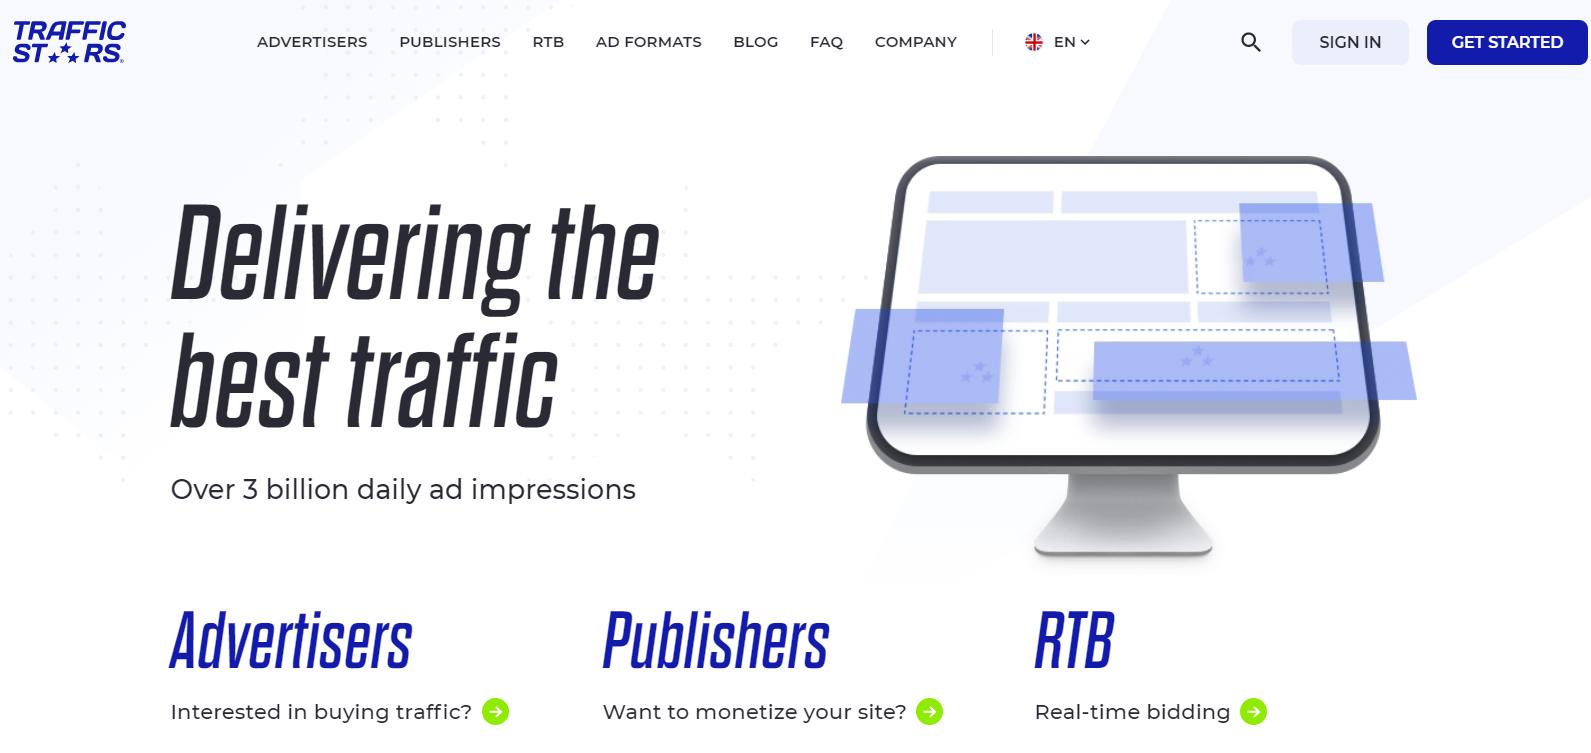 Trafficstars-Overview